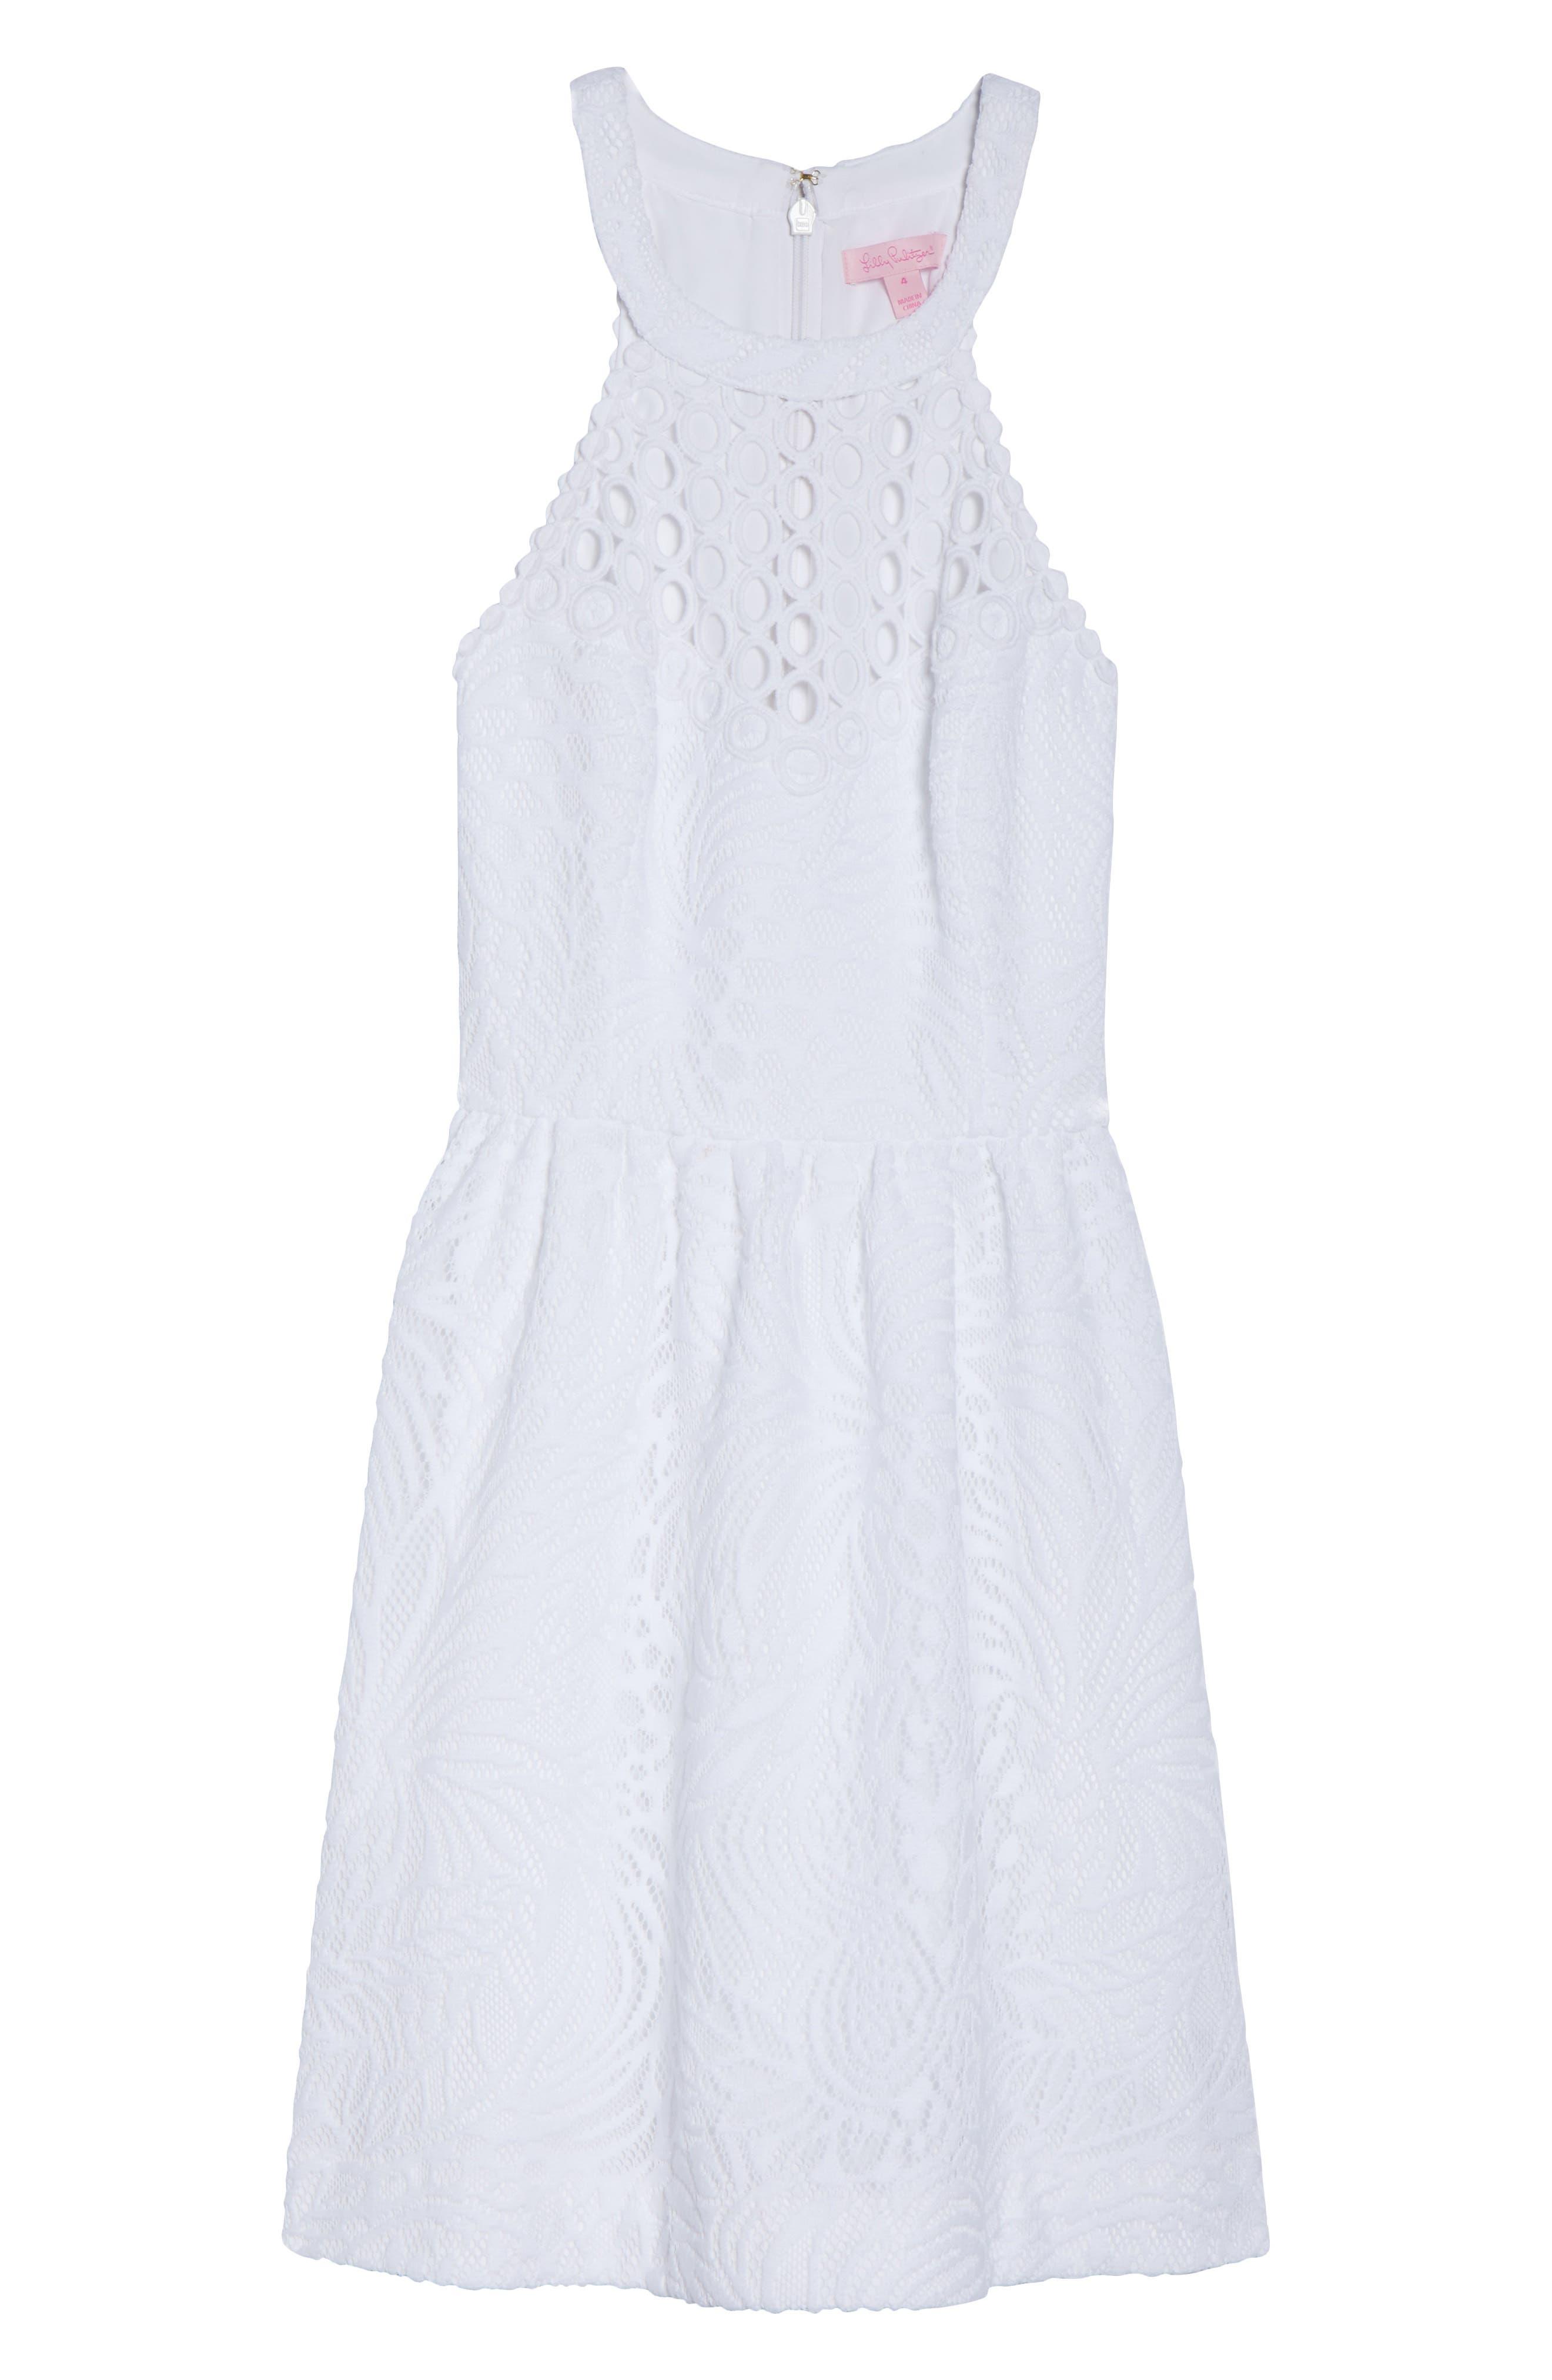 Kinley Halter Dress,                             Alternate thumbnail 6, color,                             RESORT WHITE TROPICAL LACE